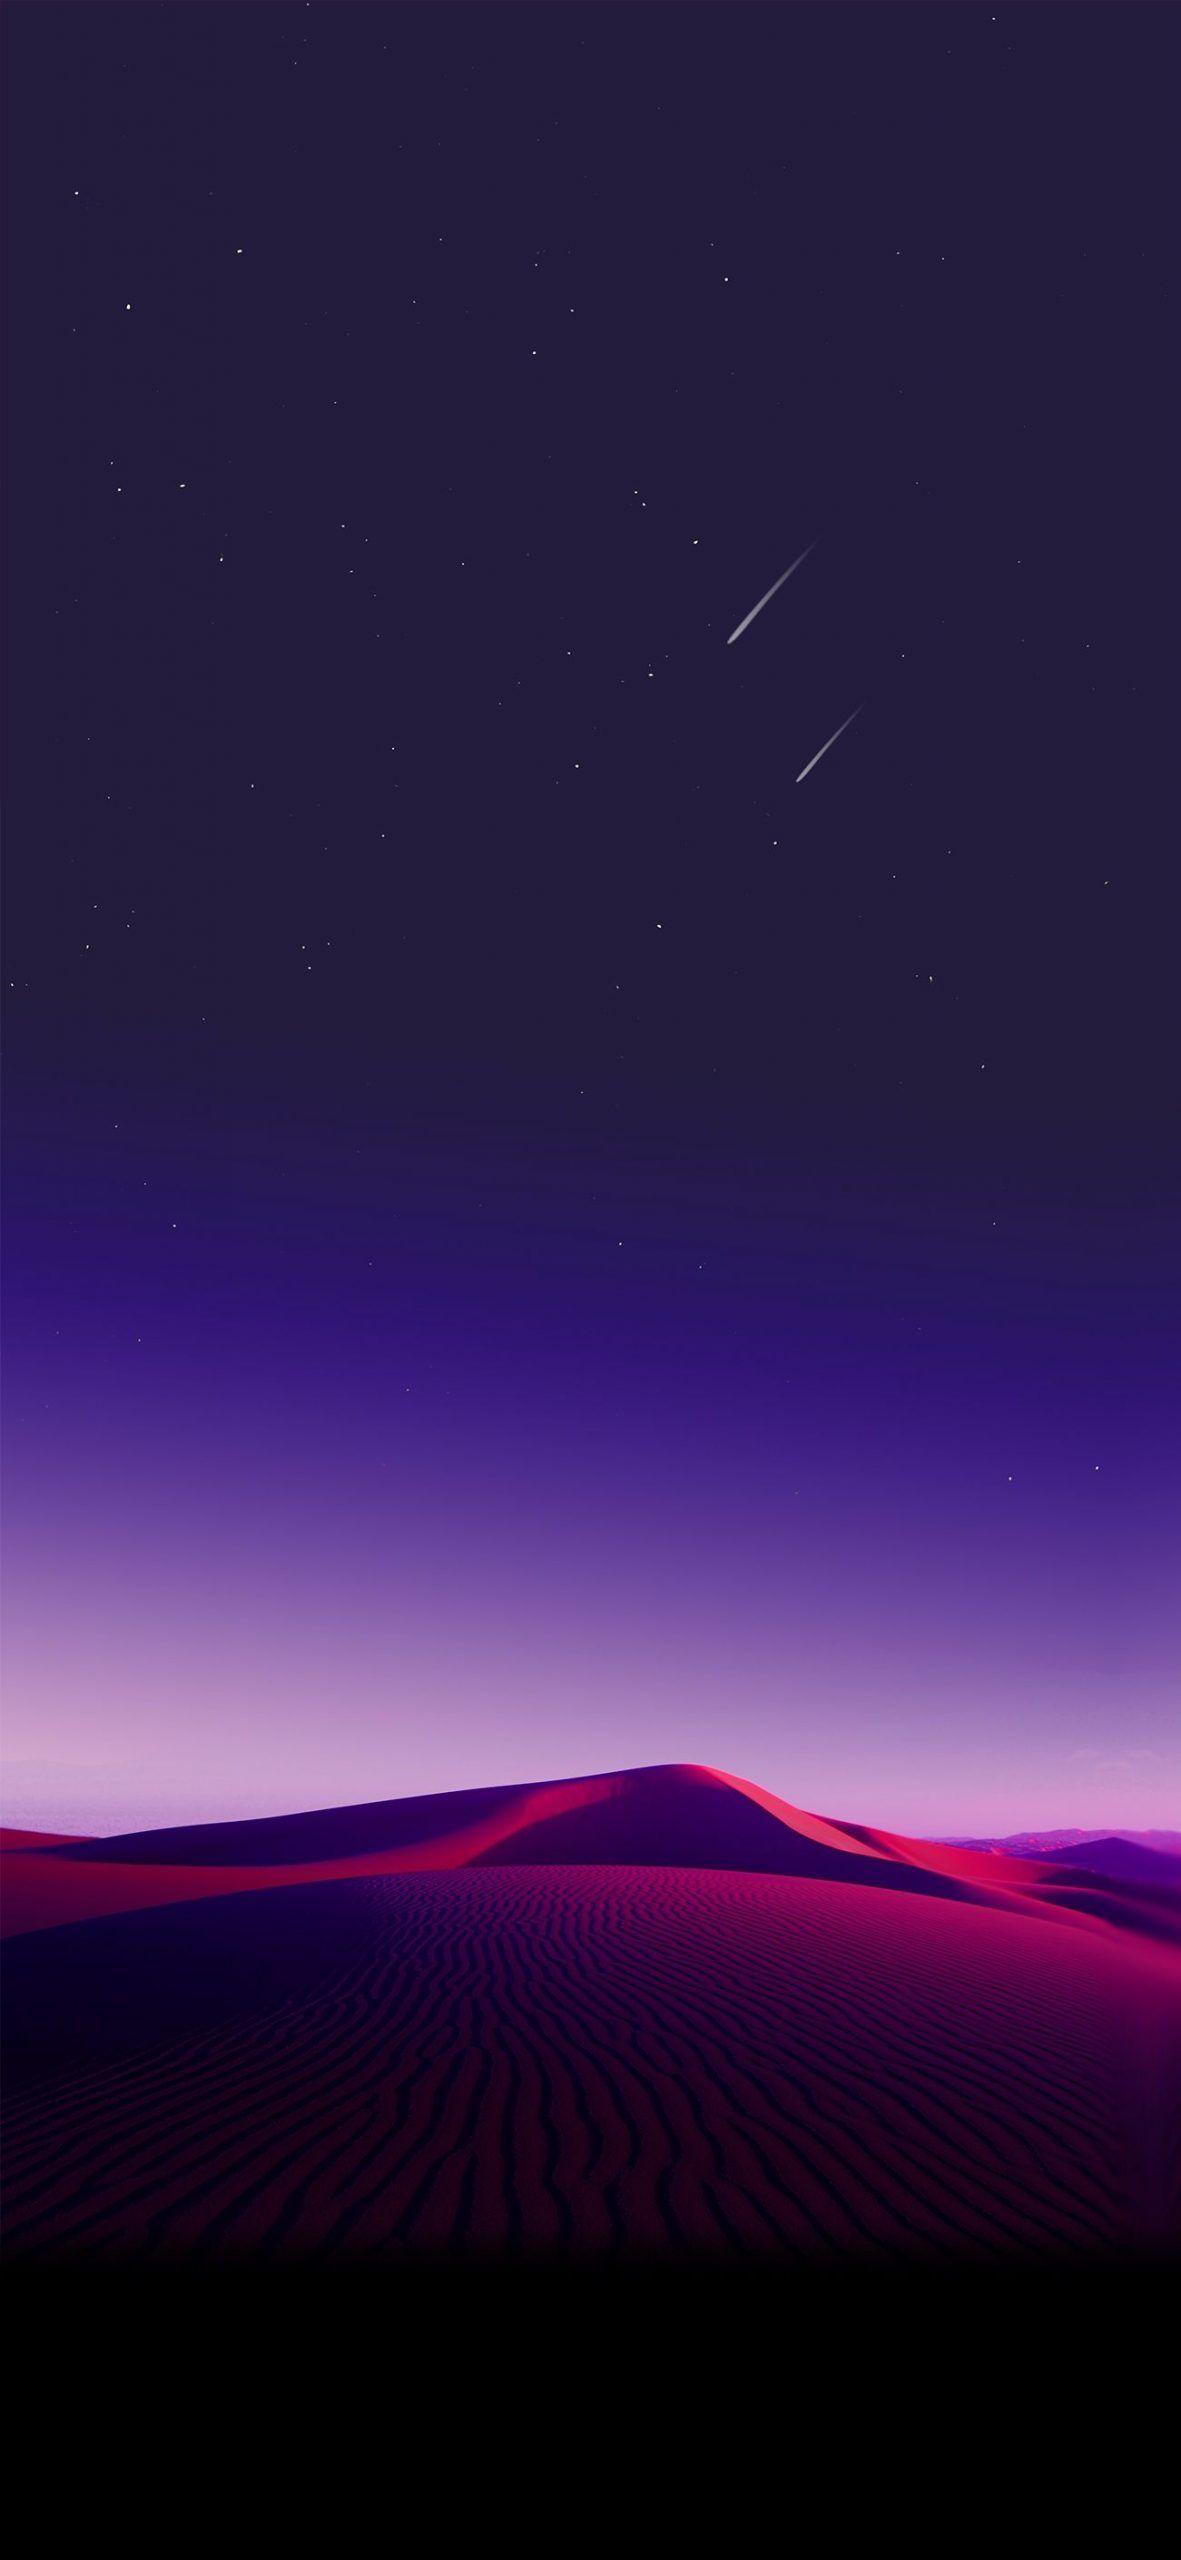 Gradient Sky Desert IPhone Wallpaper Scaled - IPhone Wallpapers